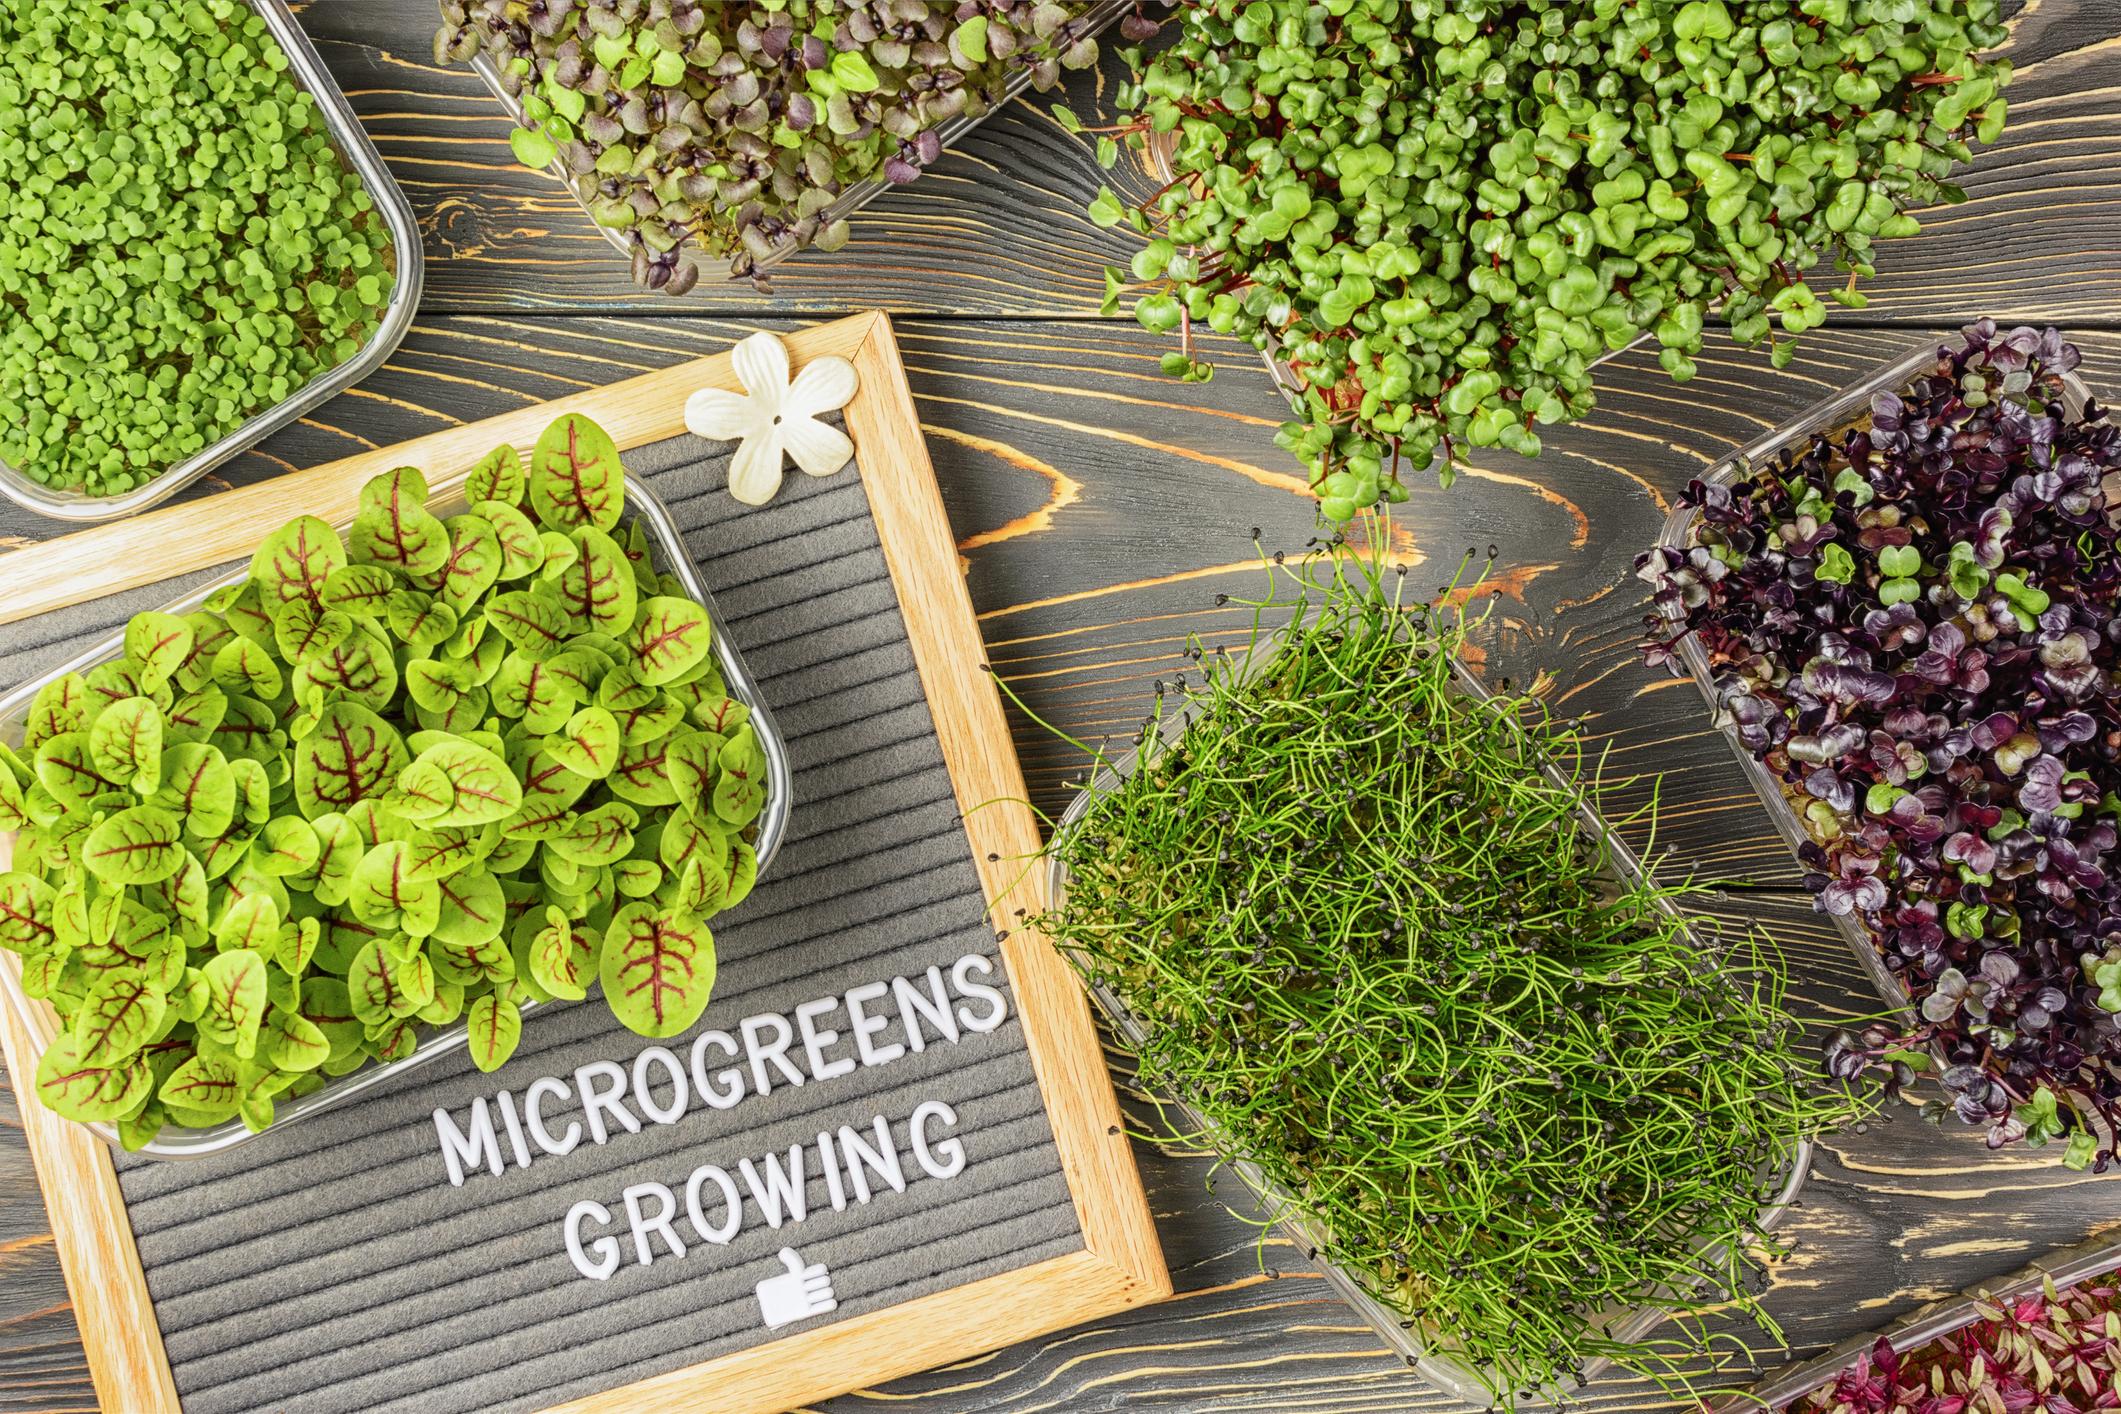 Adult Craft Kits to Go: Microgreens